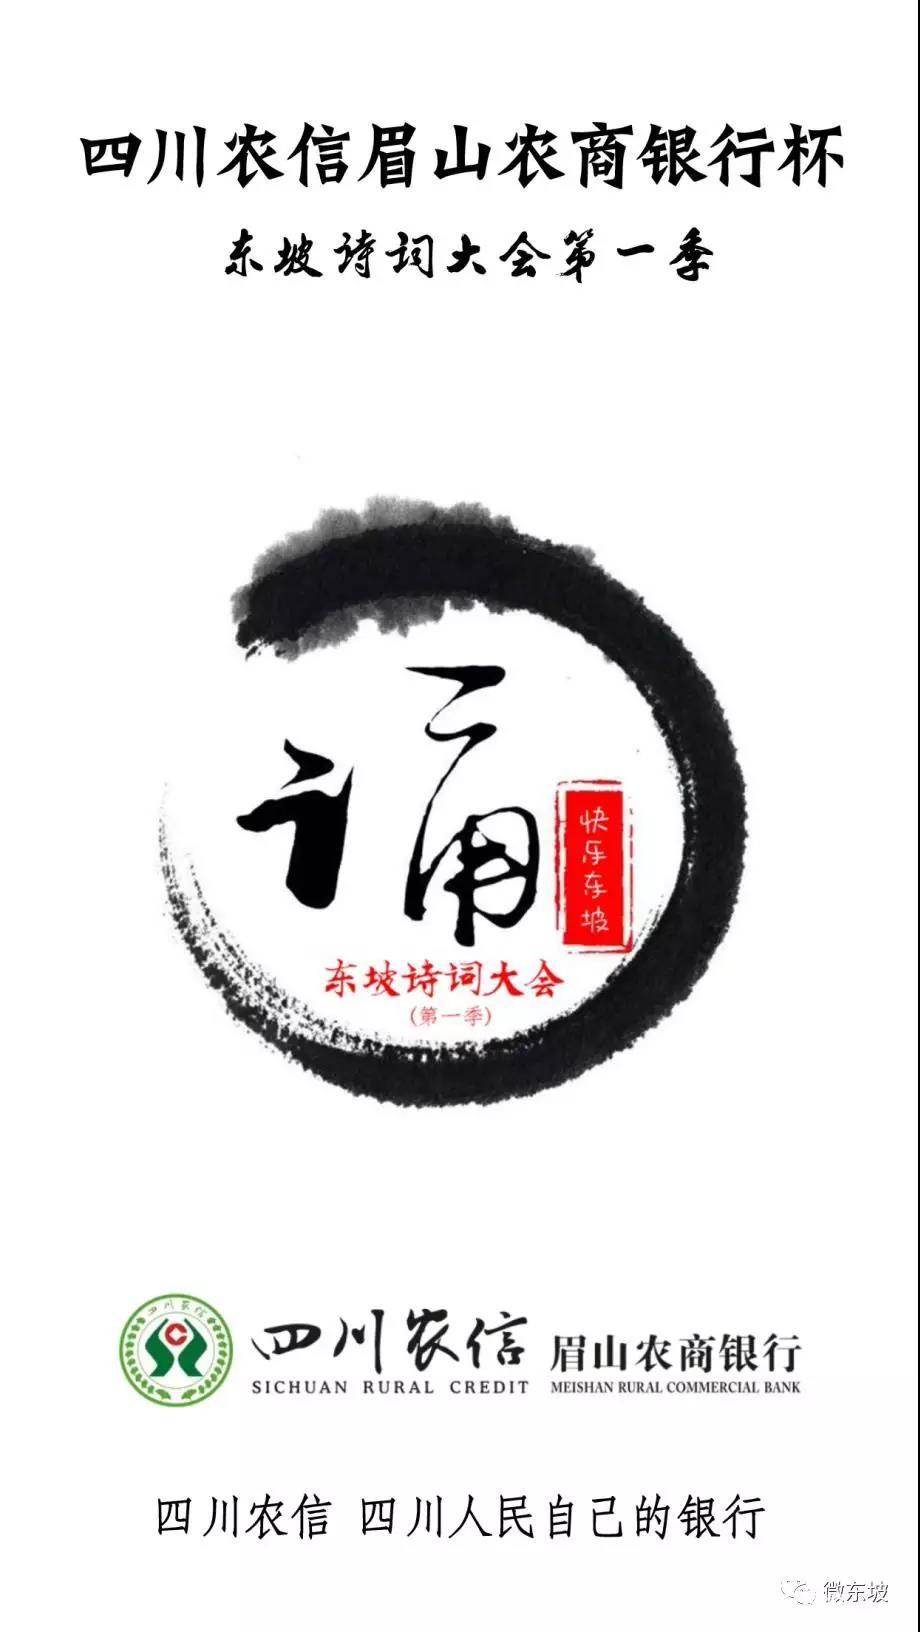 <b>诵东坡诗词 赢万元大奖 《东坡诗词大会》第一季来了!</b>